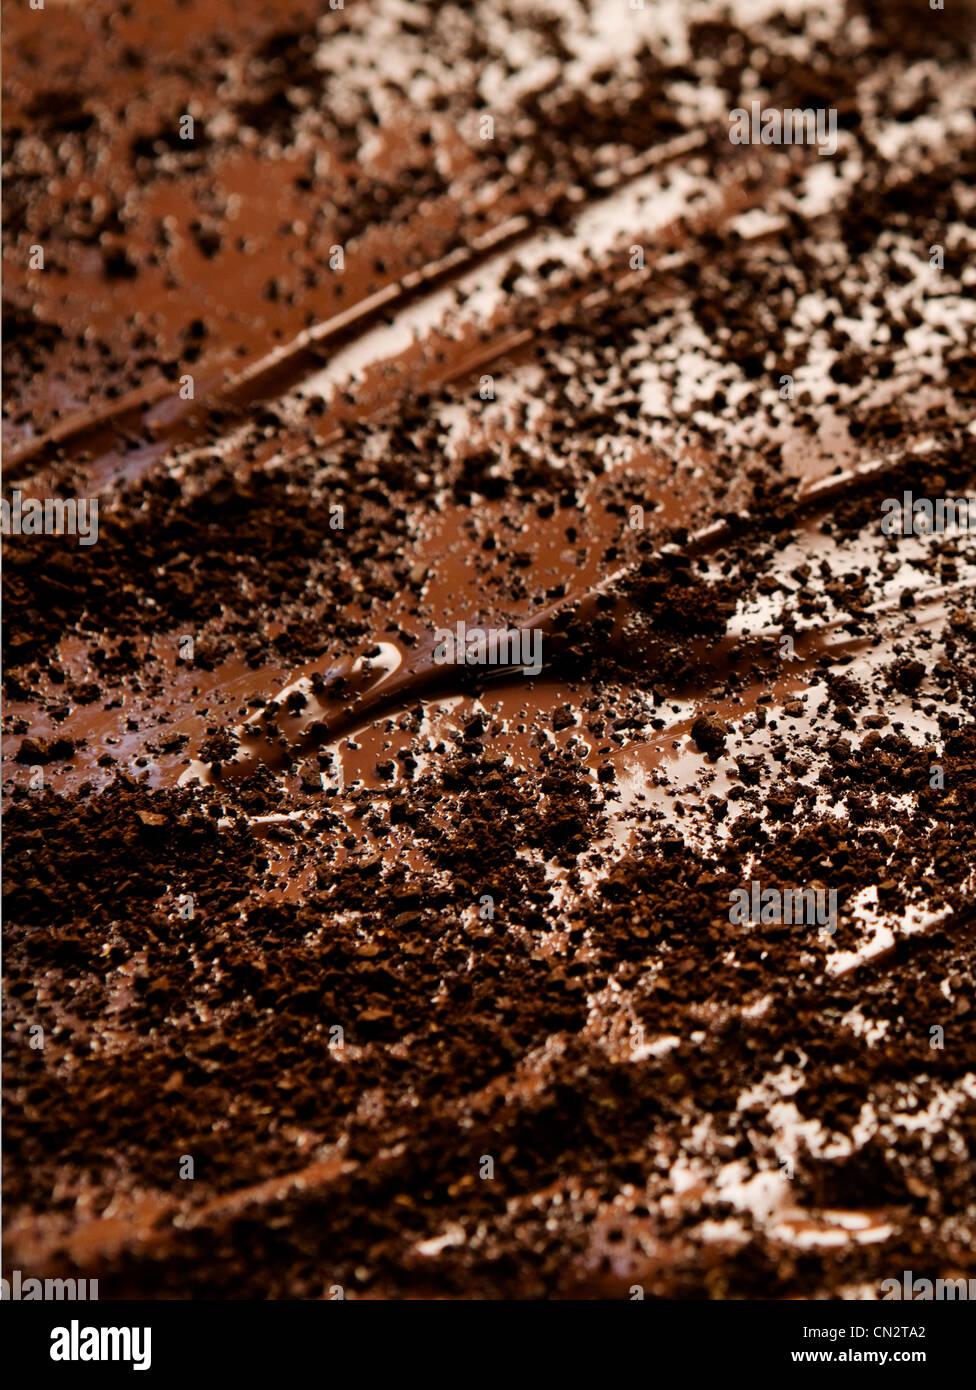 Chocolate icing, full frame - Stock Image